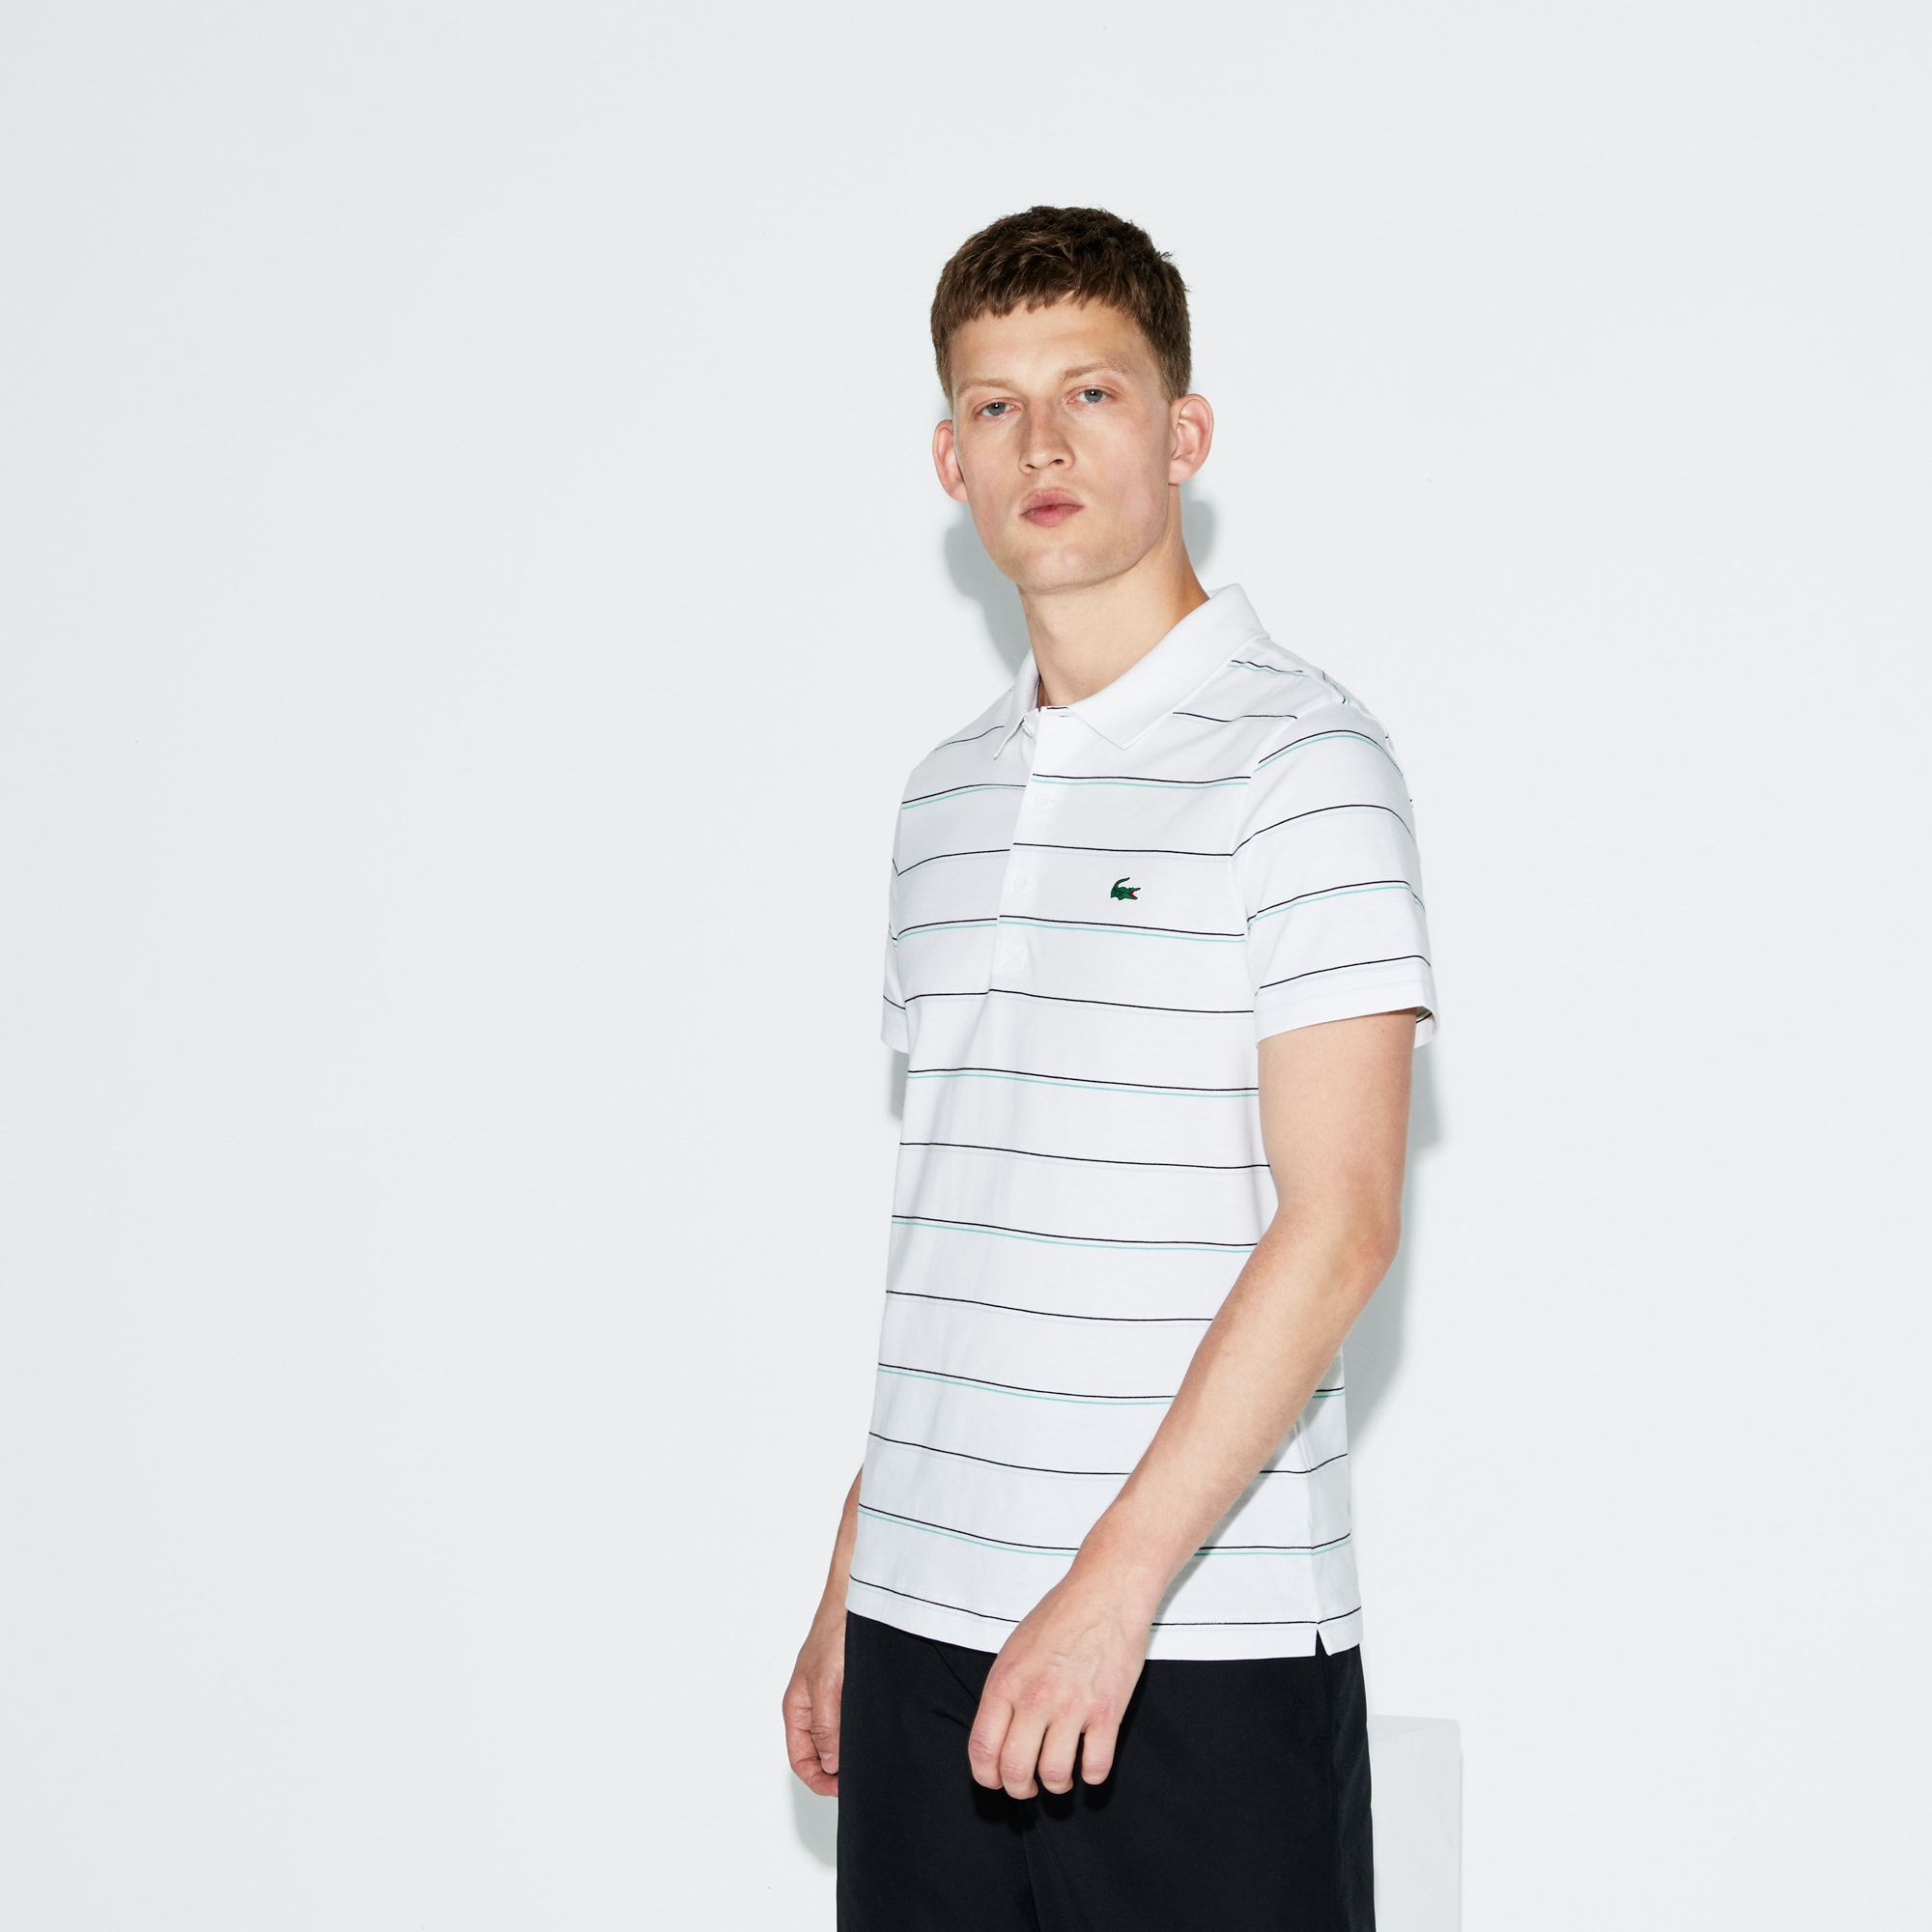 Herren LACOSTE SPORT gestreiftes Tennis-Poloshirt aus Baumwolljersey